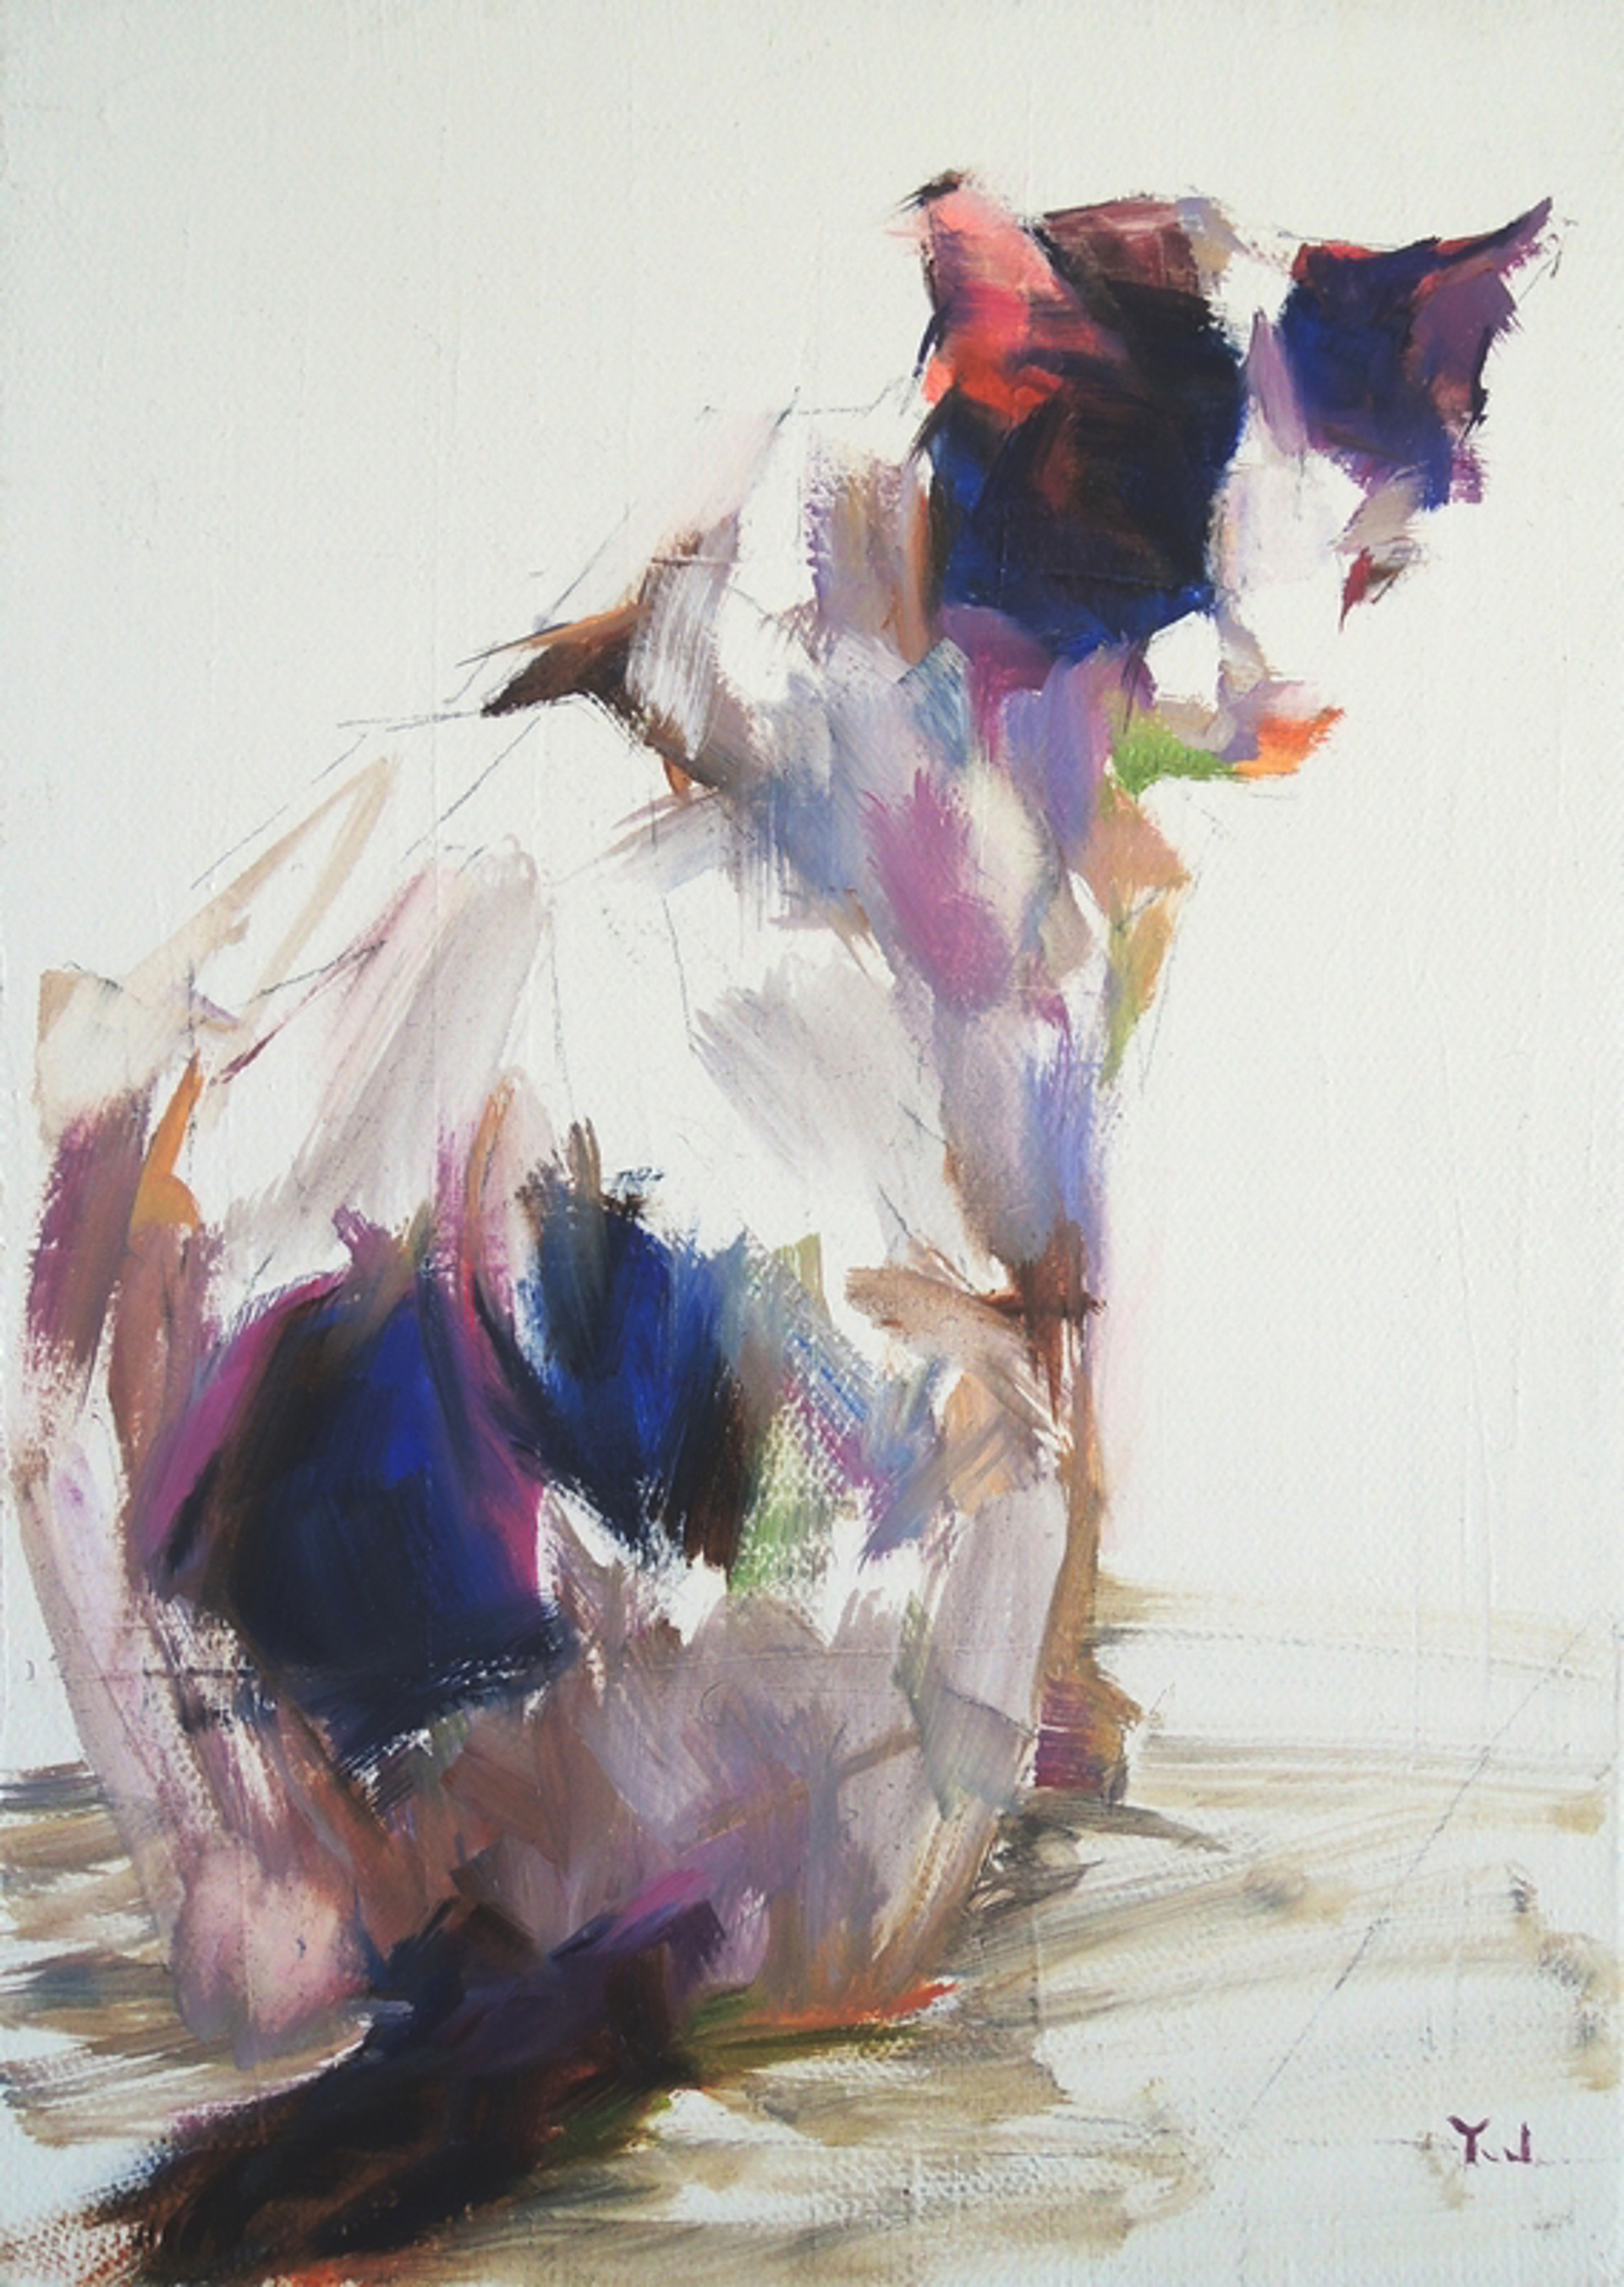 Rocky Color Study 3 by Yael Maimon